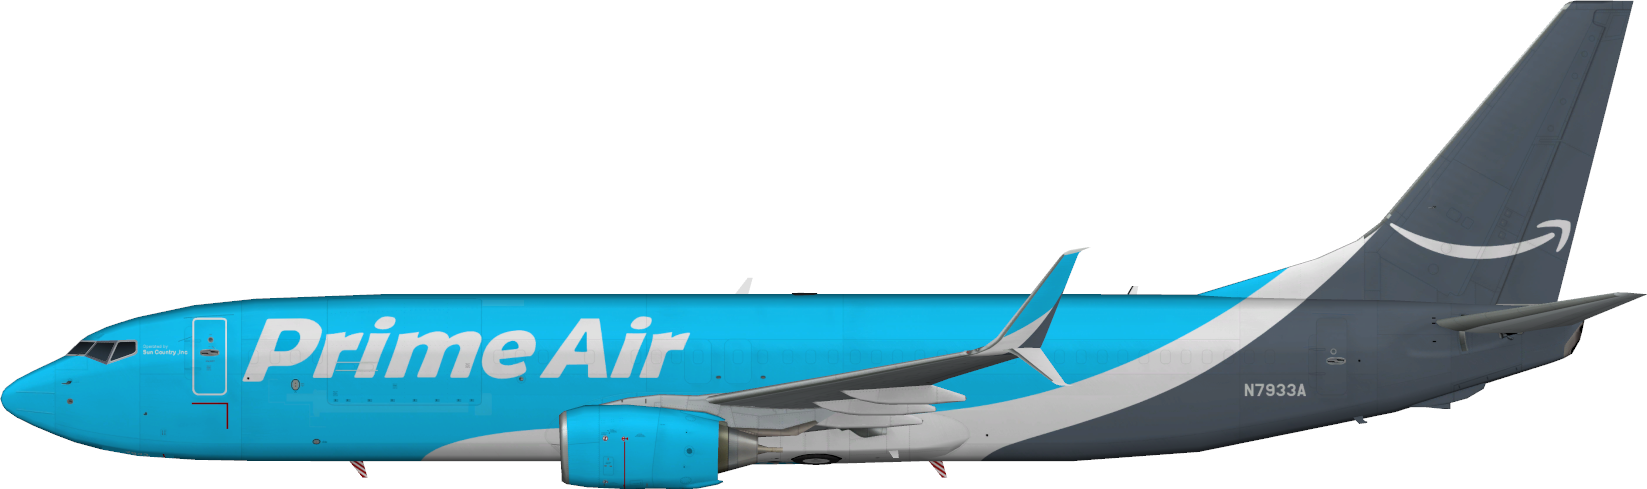 SCX N7933A